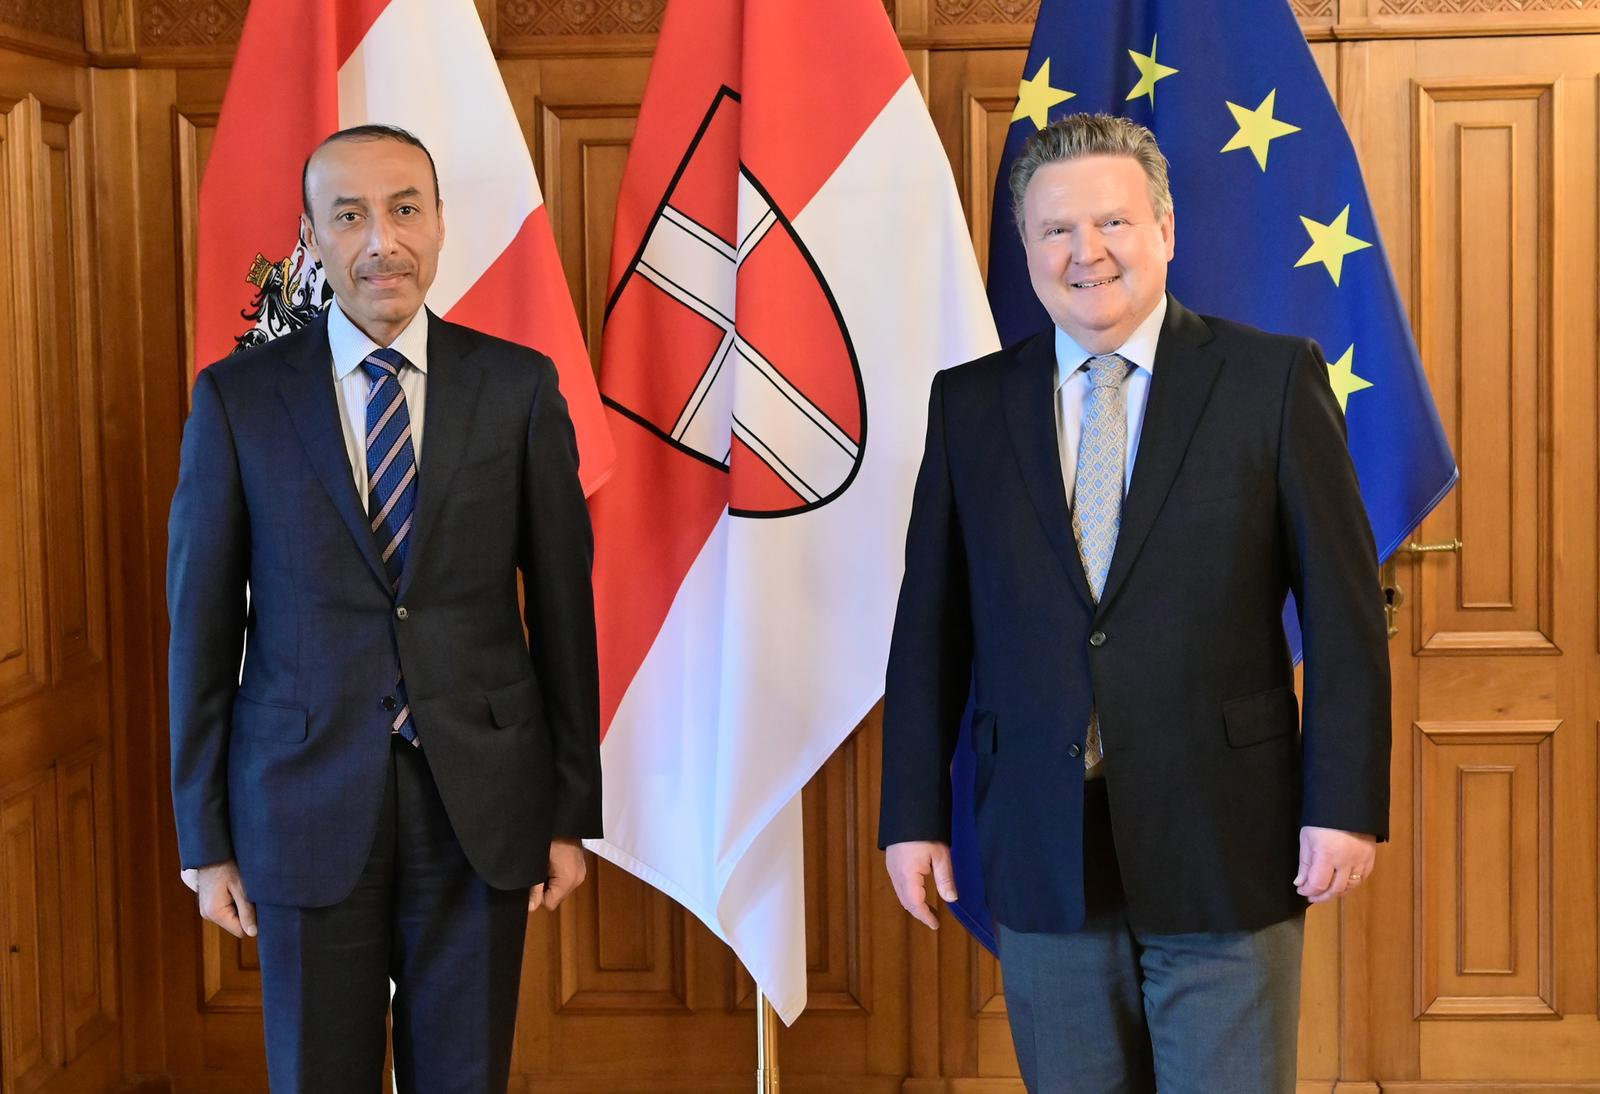 Socialist Mayor-Governor of Vienna Affirms Depth of Austrian-Qatari Relations